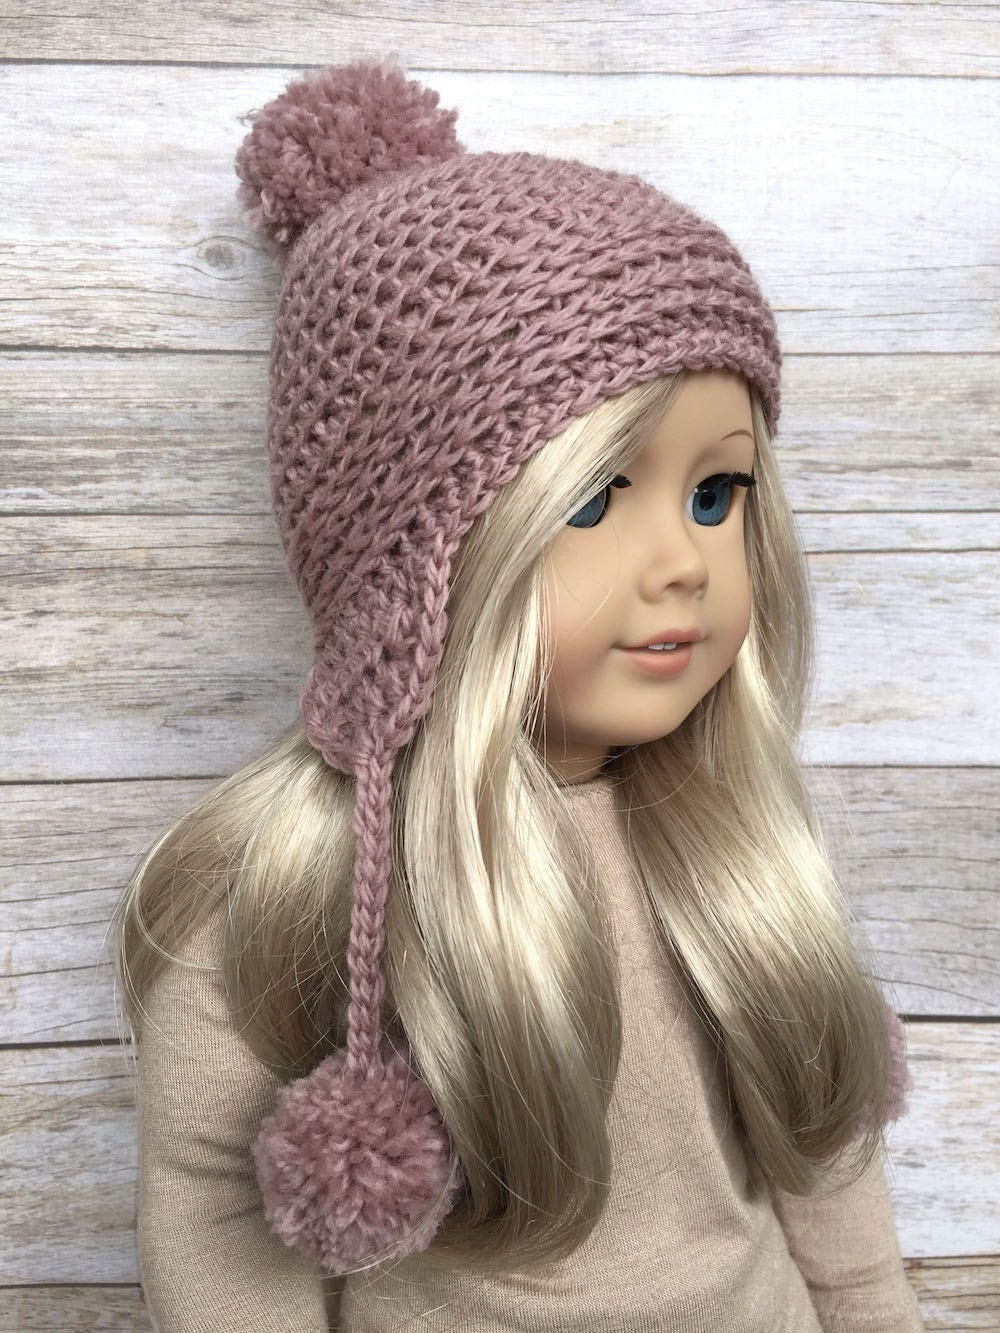 Diy Crochet Pattern 18 Inch Doll Pom Pom Earflap Hat Pdf 24 Etsy